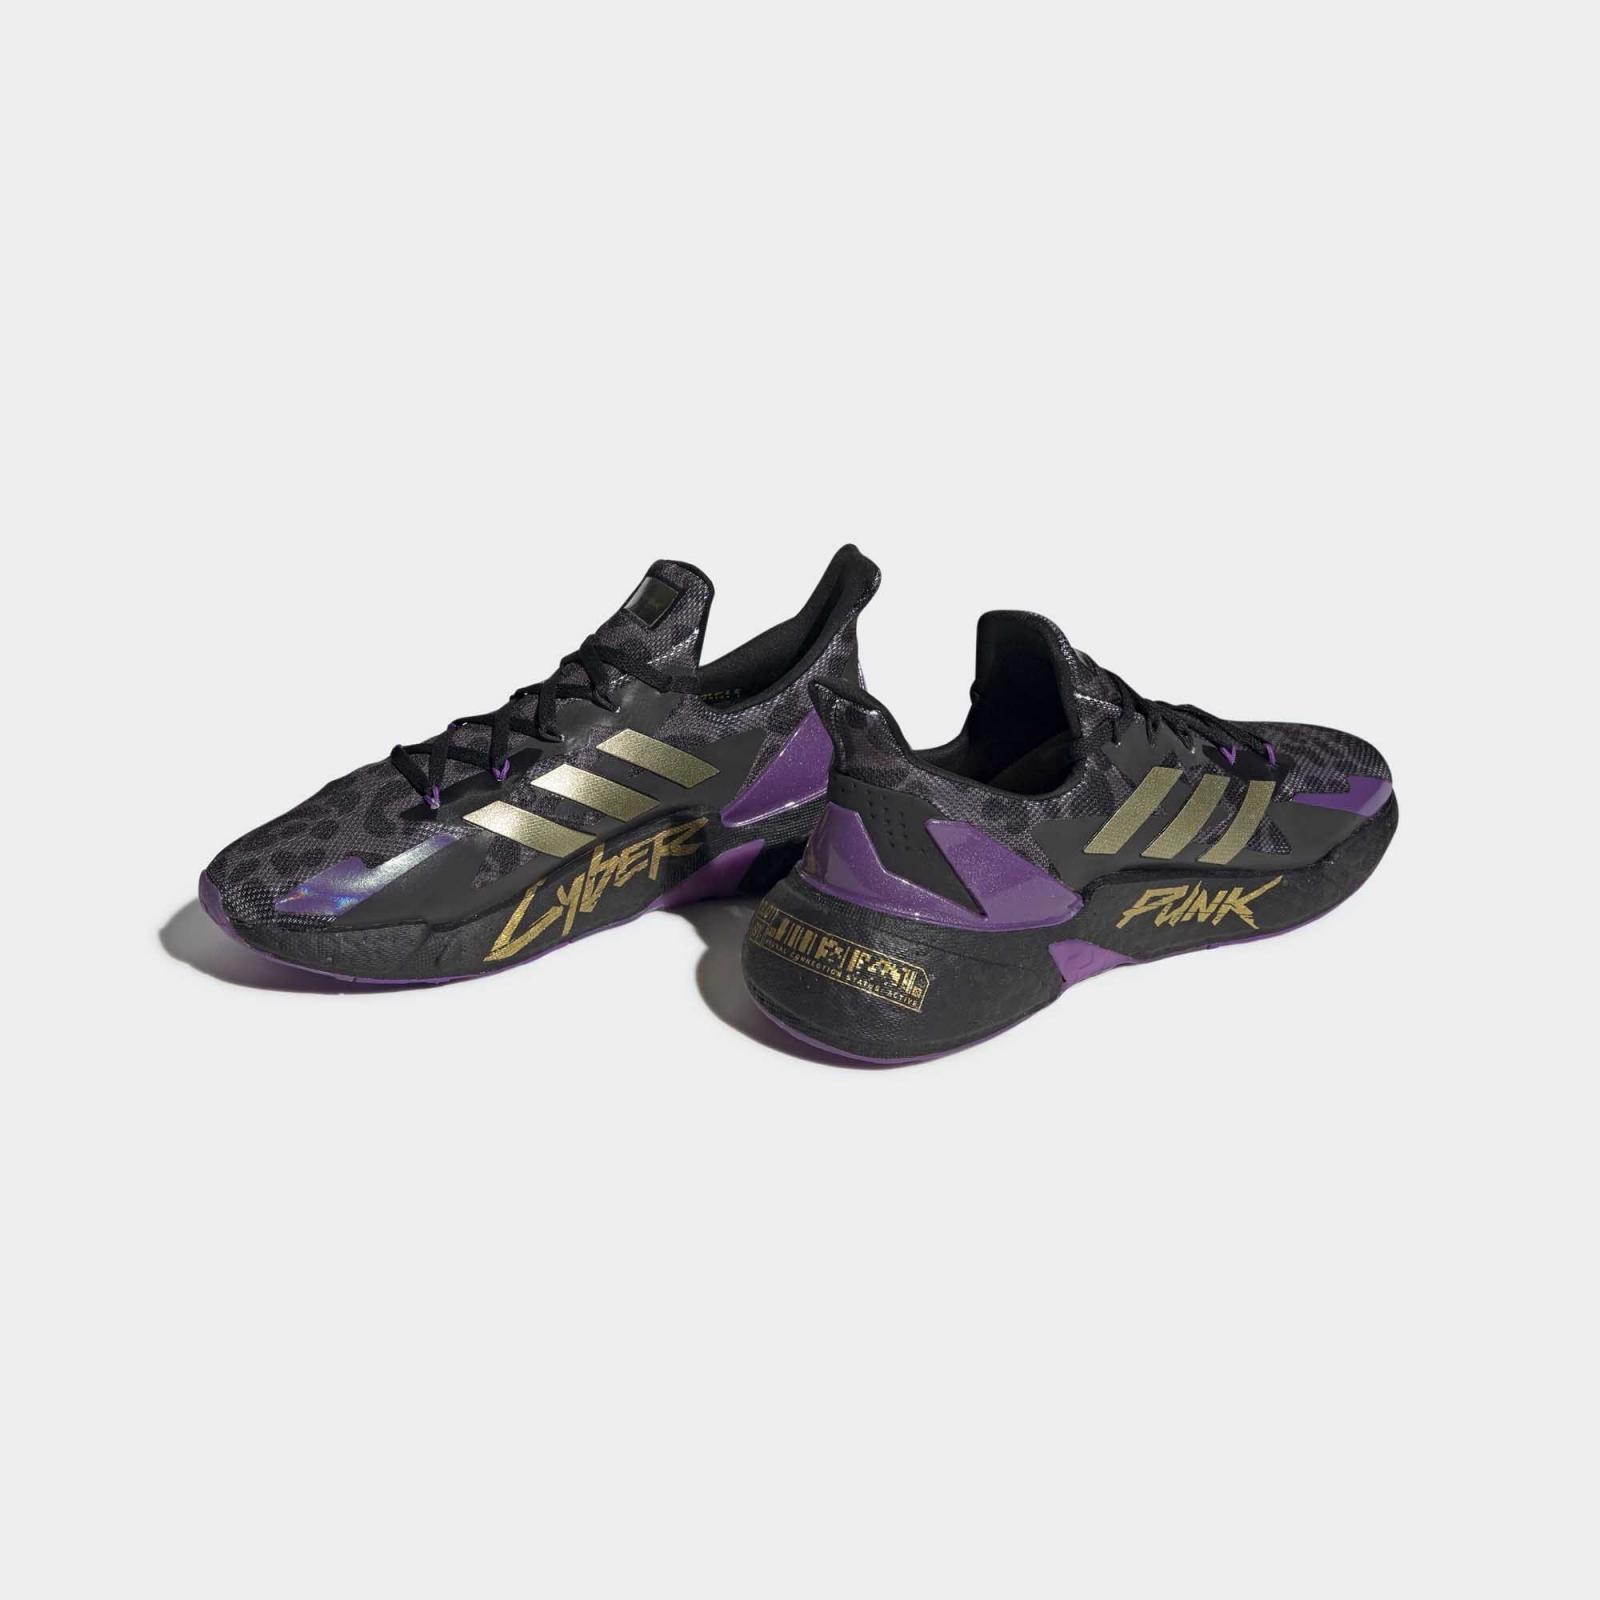 adidas Running发布全新一号黑/金/碳黑色X9000L4 Cyberpunk 2077